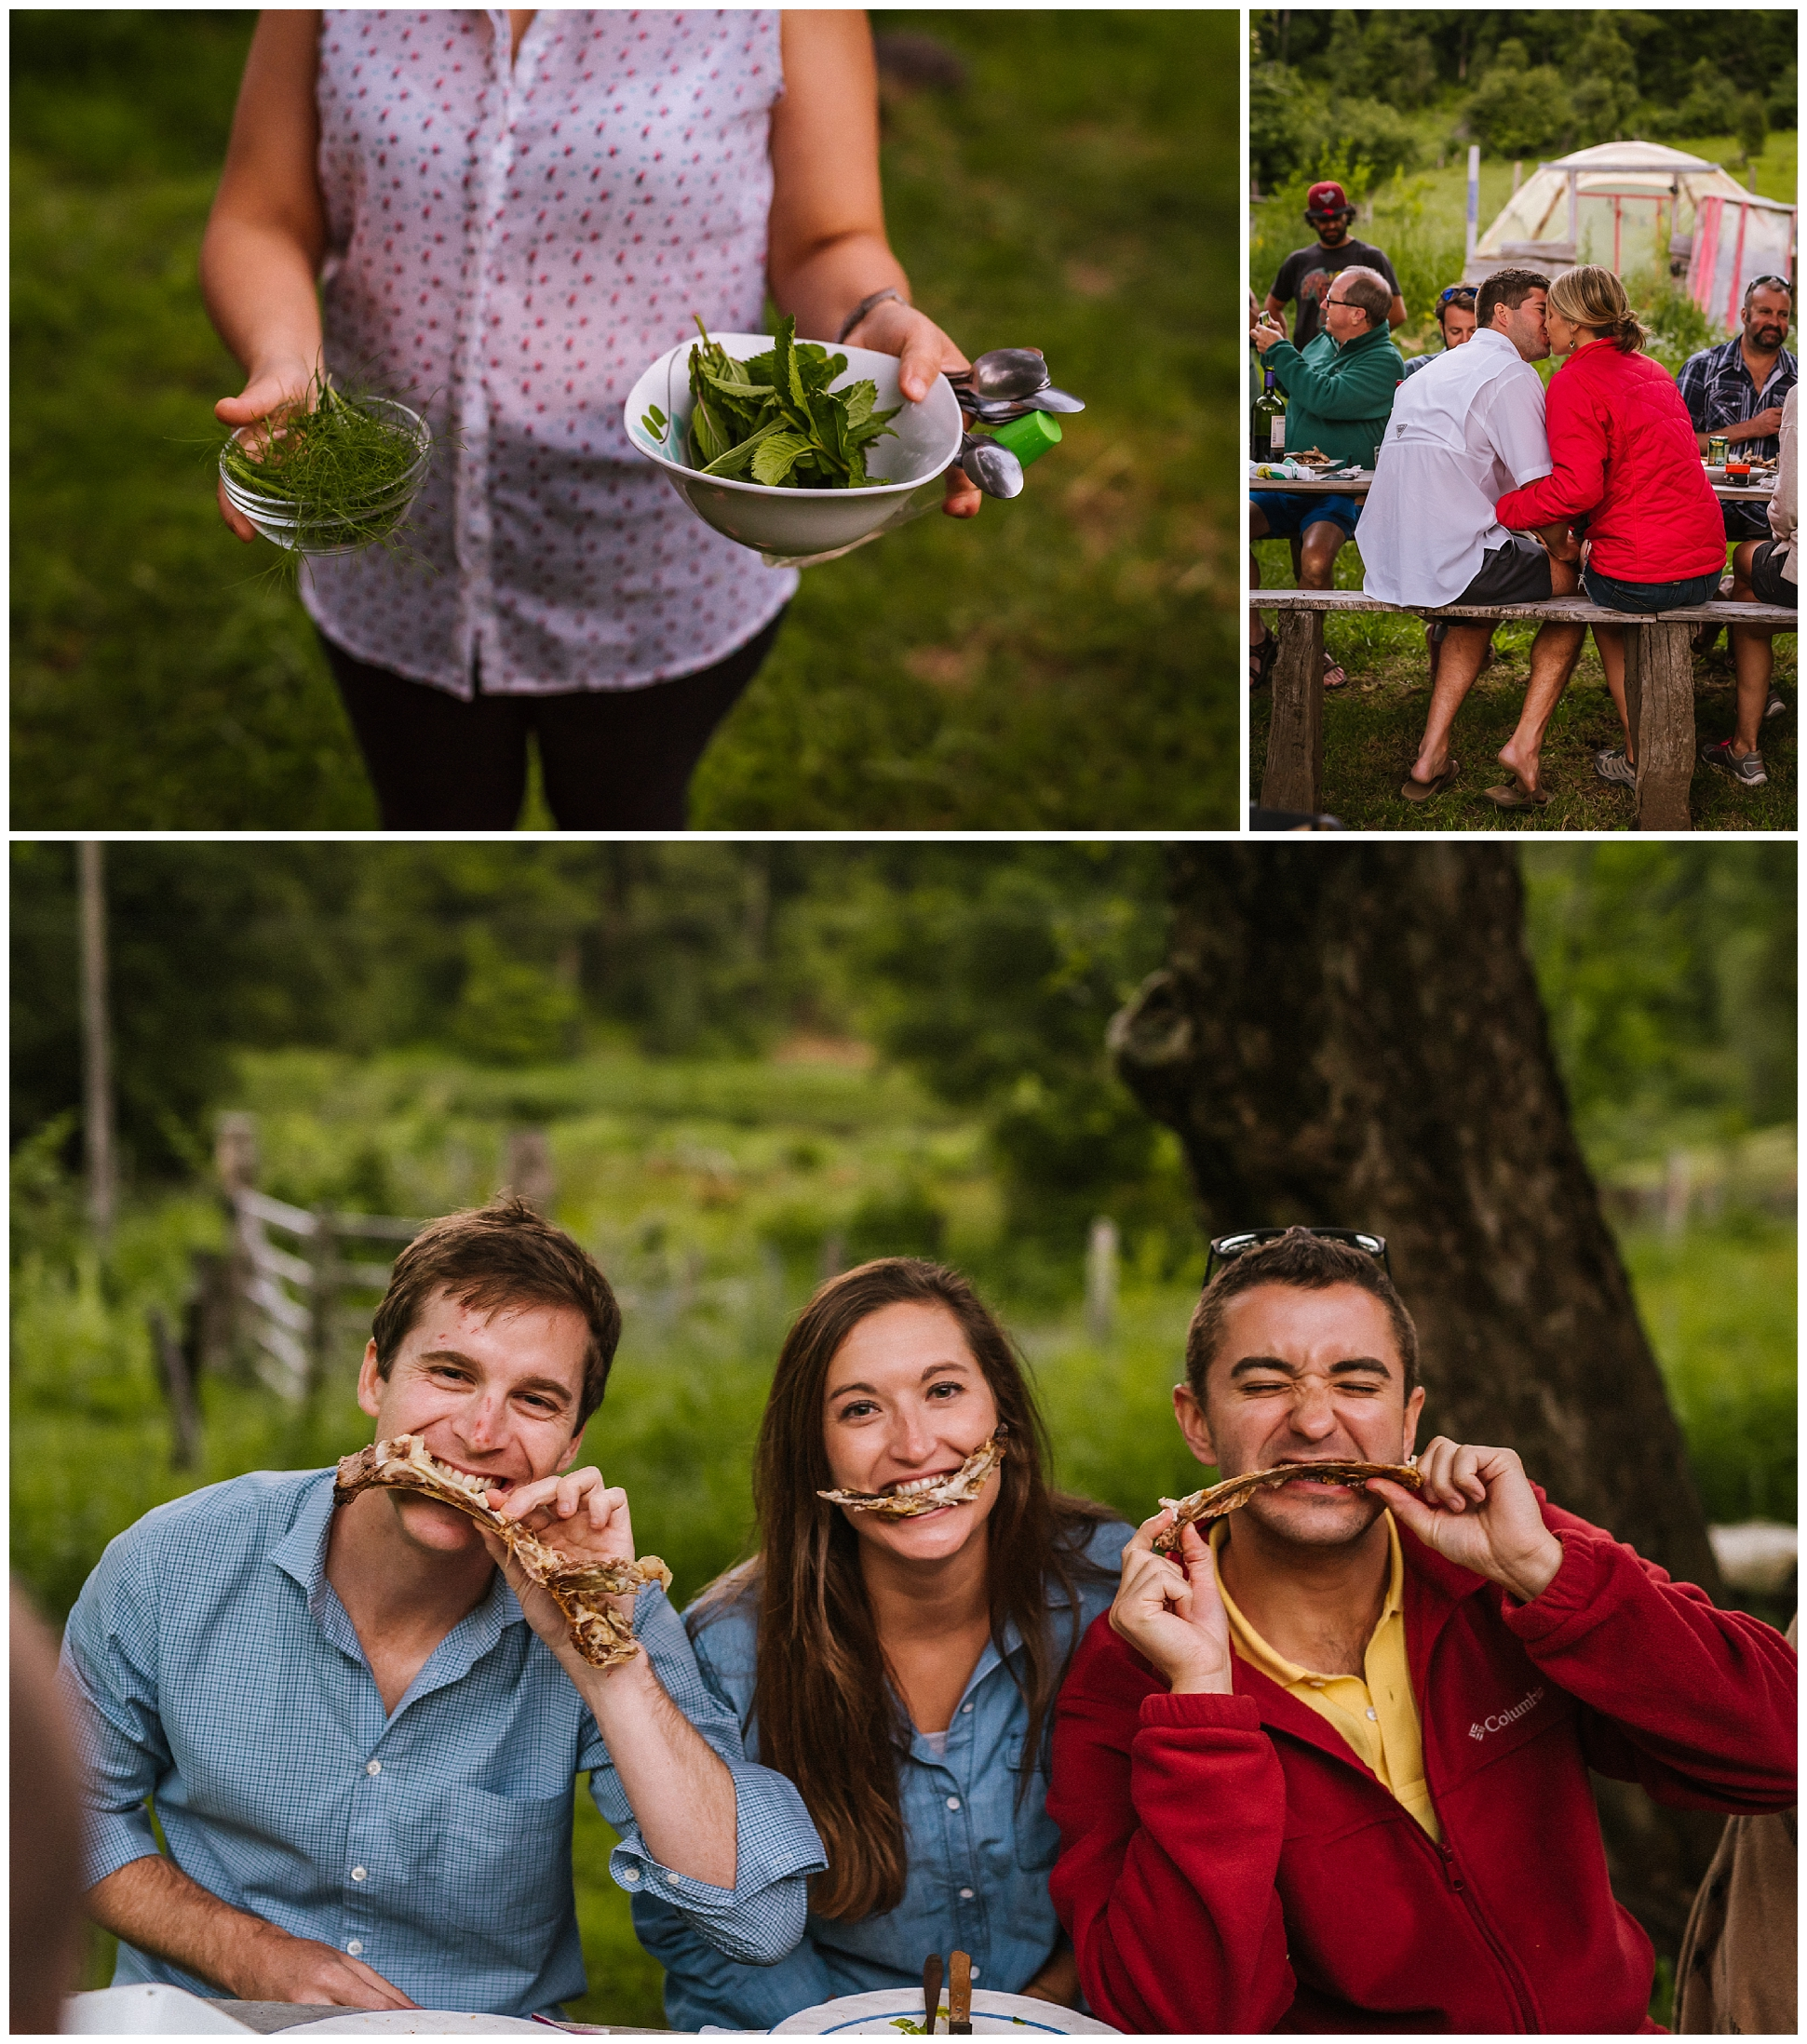 Cheilean-destination-adventure-wedding-florida-patagonia-pucon-santa-cruz-vsco_0049.jpg